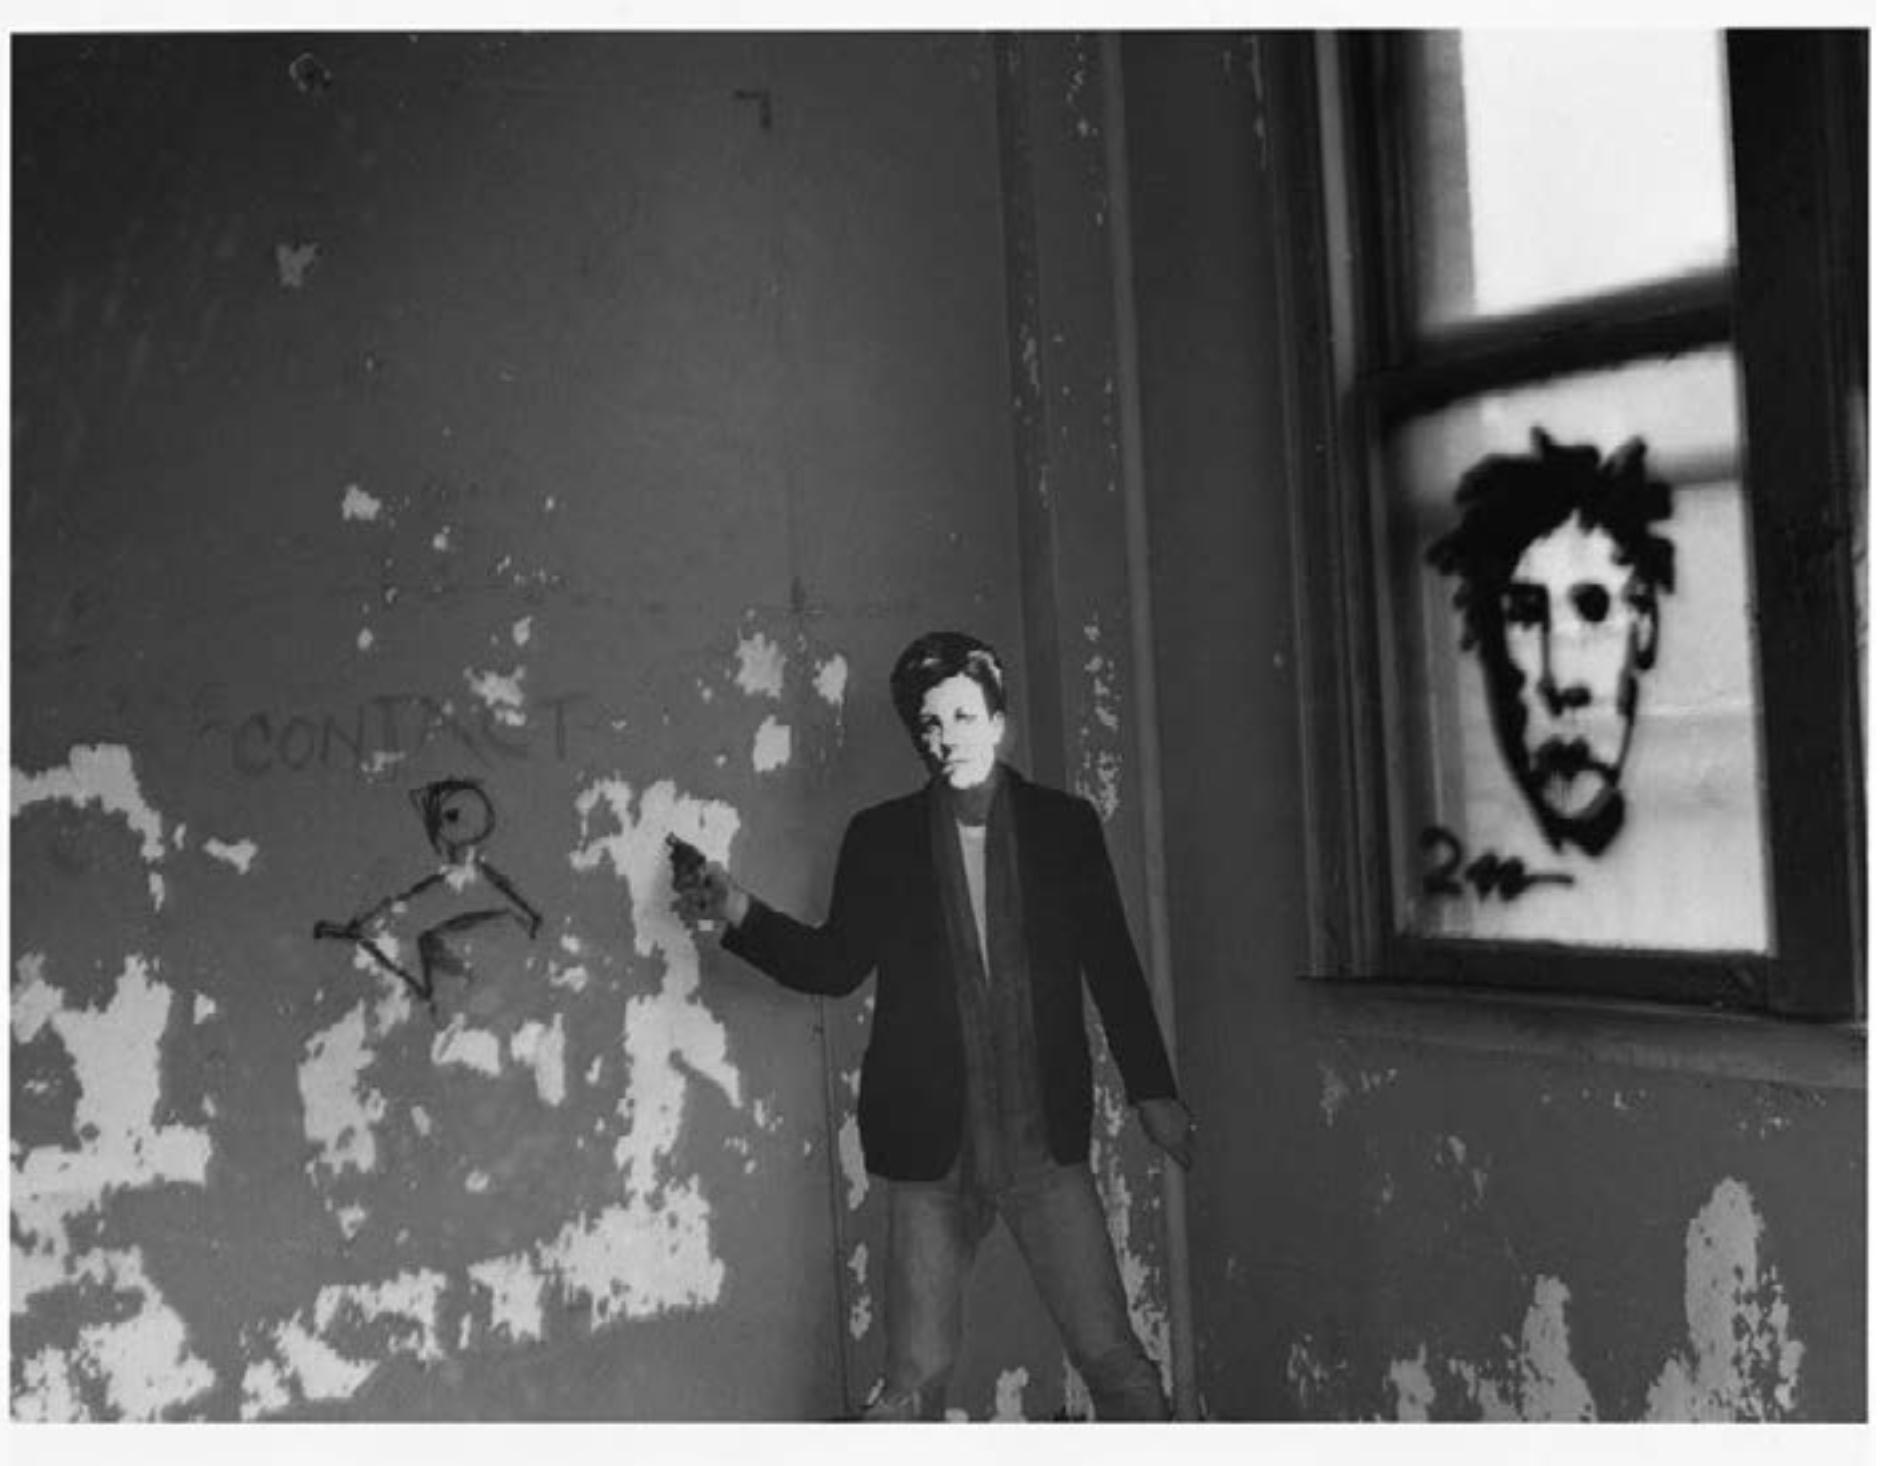 David Wojnarovicz,  Arthur Rimbaud in New York (contact, with gun) , 1978-79/2004